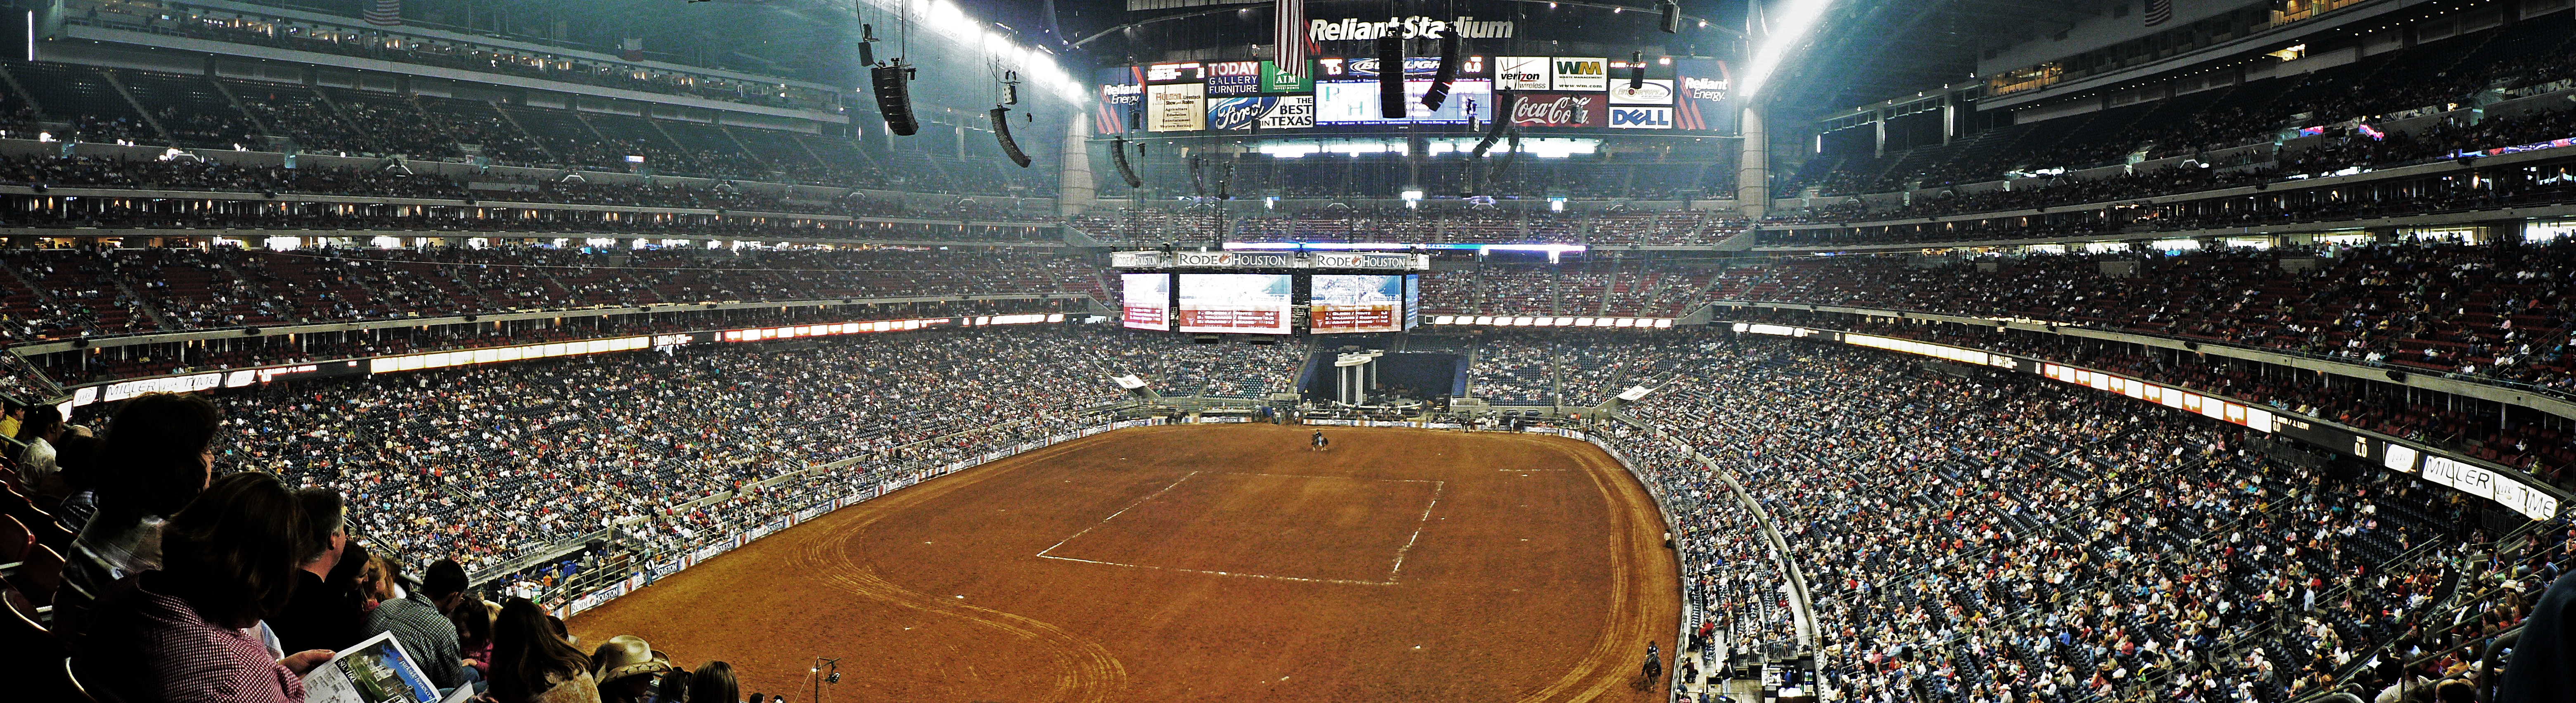 File:Reliant Stadium Houston Rodeo.jpg - Wikimedia Commons